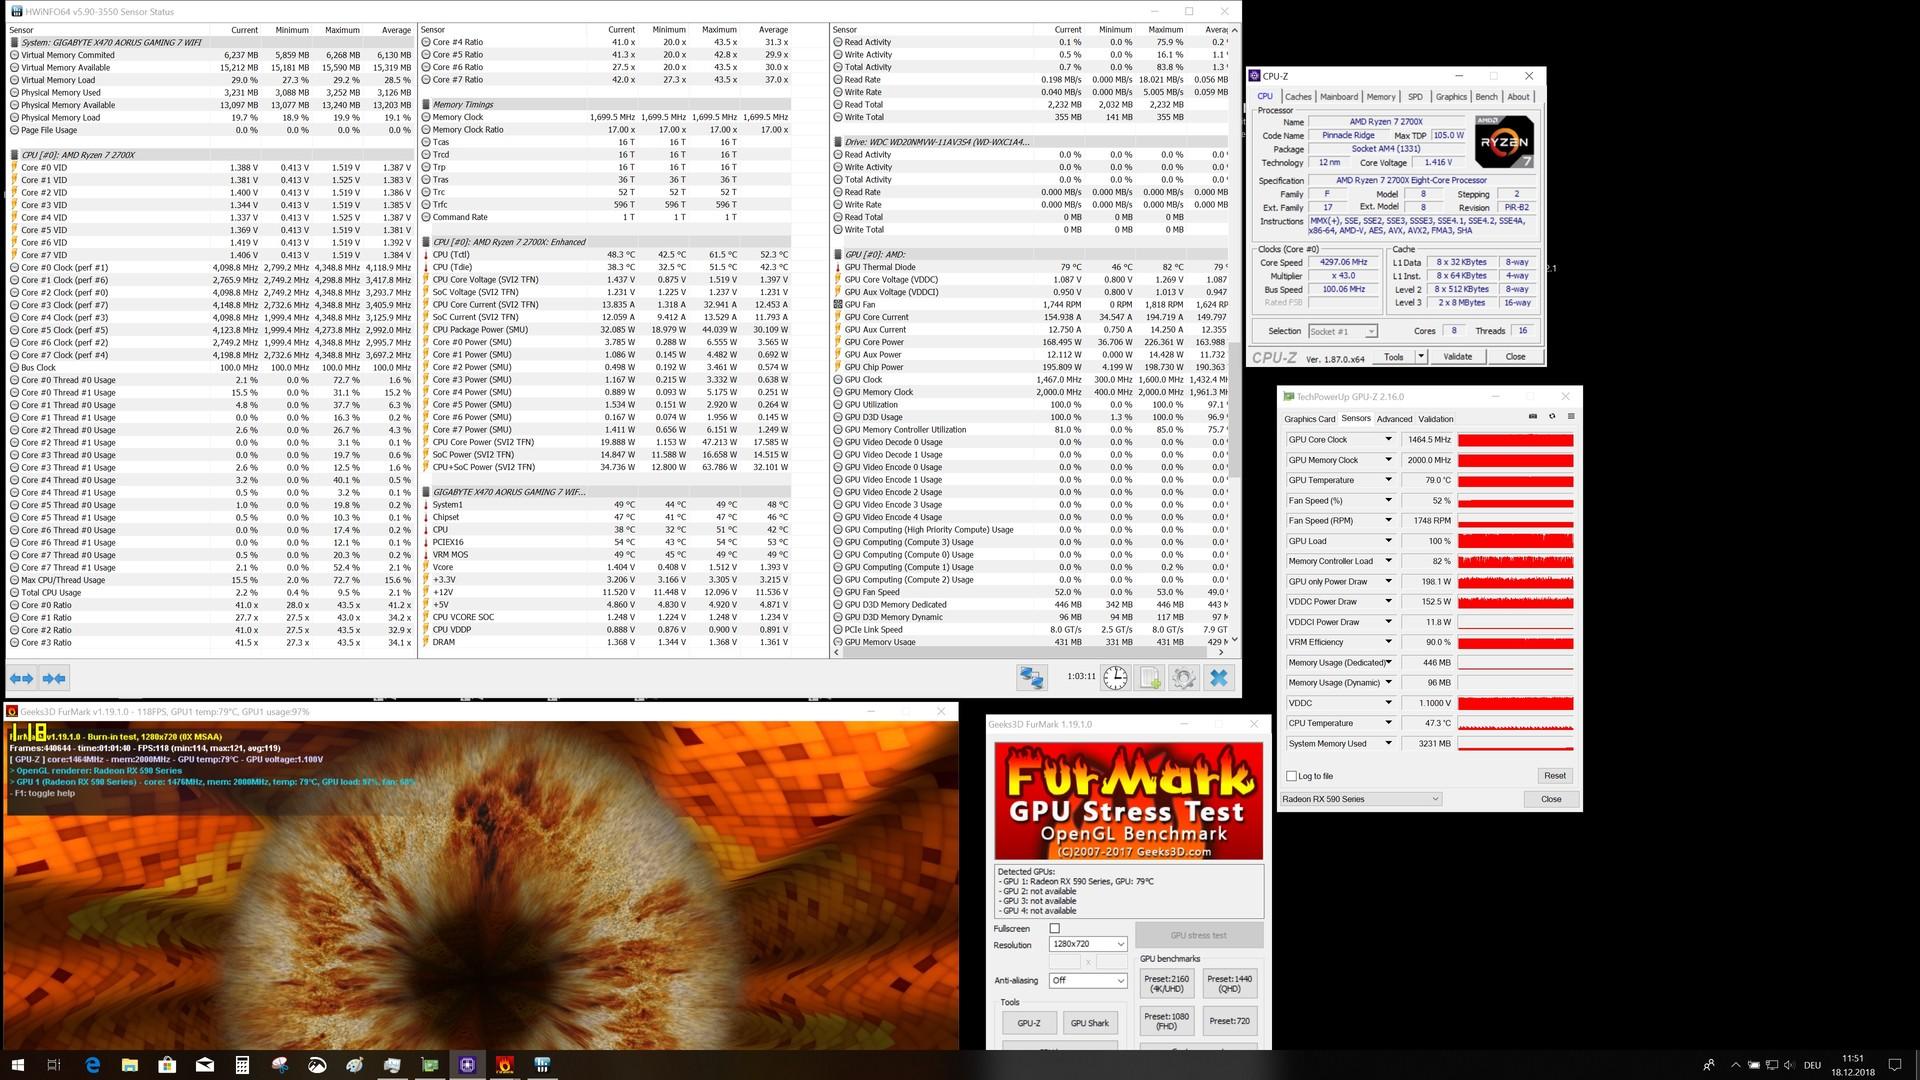 XFX讯景RX590 8G黑狼游戏显卡OC版评测- Notebookcheck